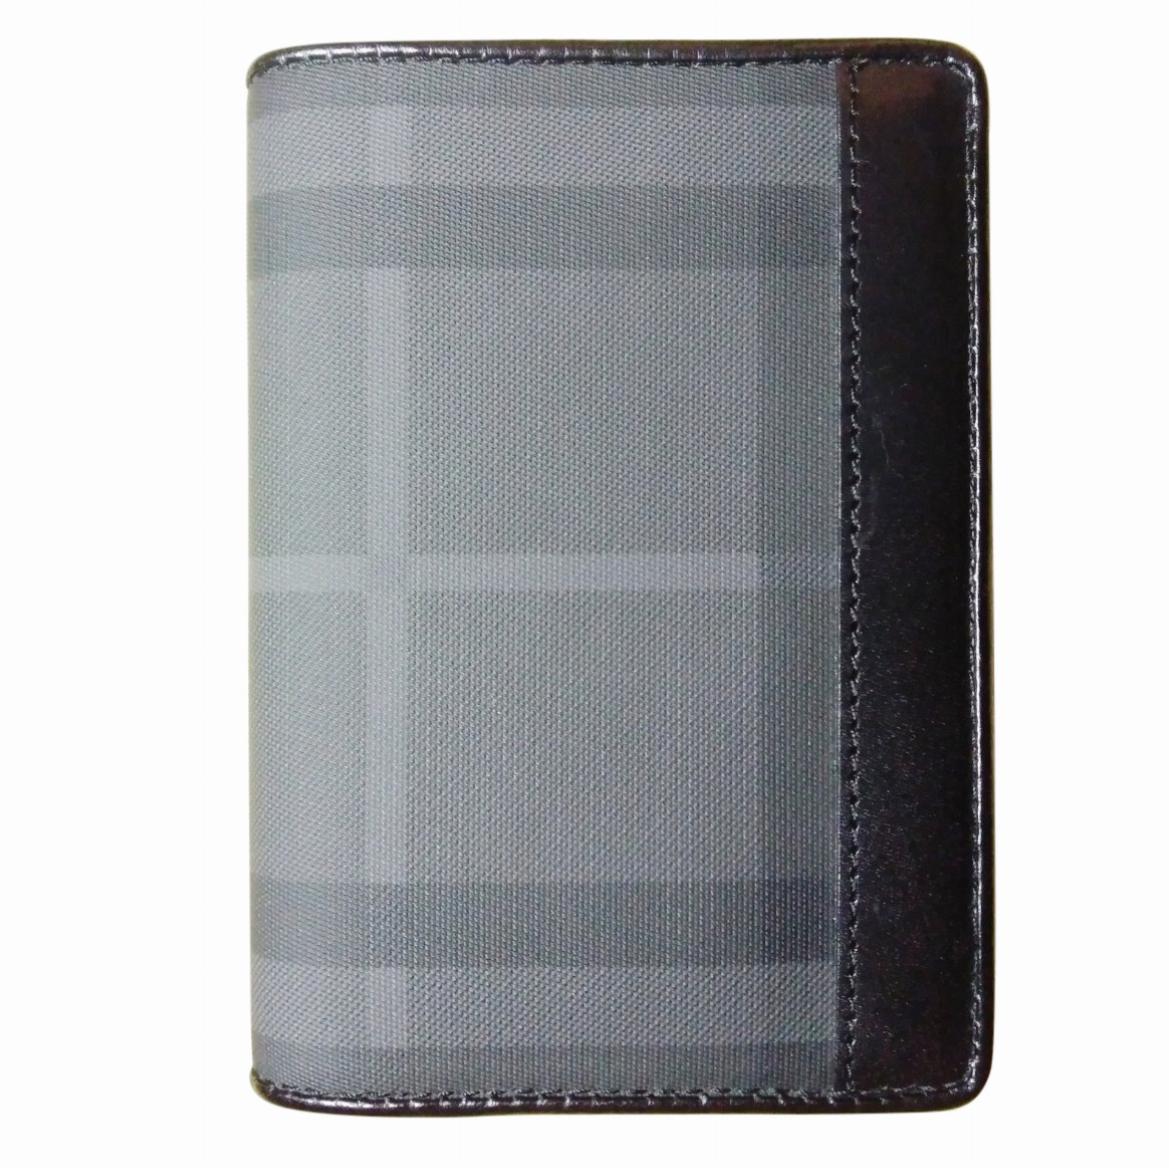 Burberry bi-fold checked wallet